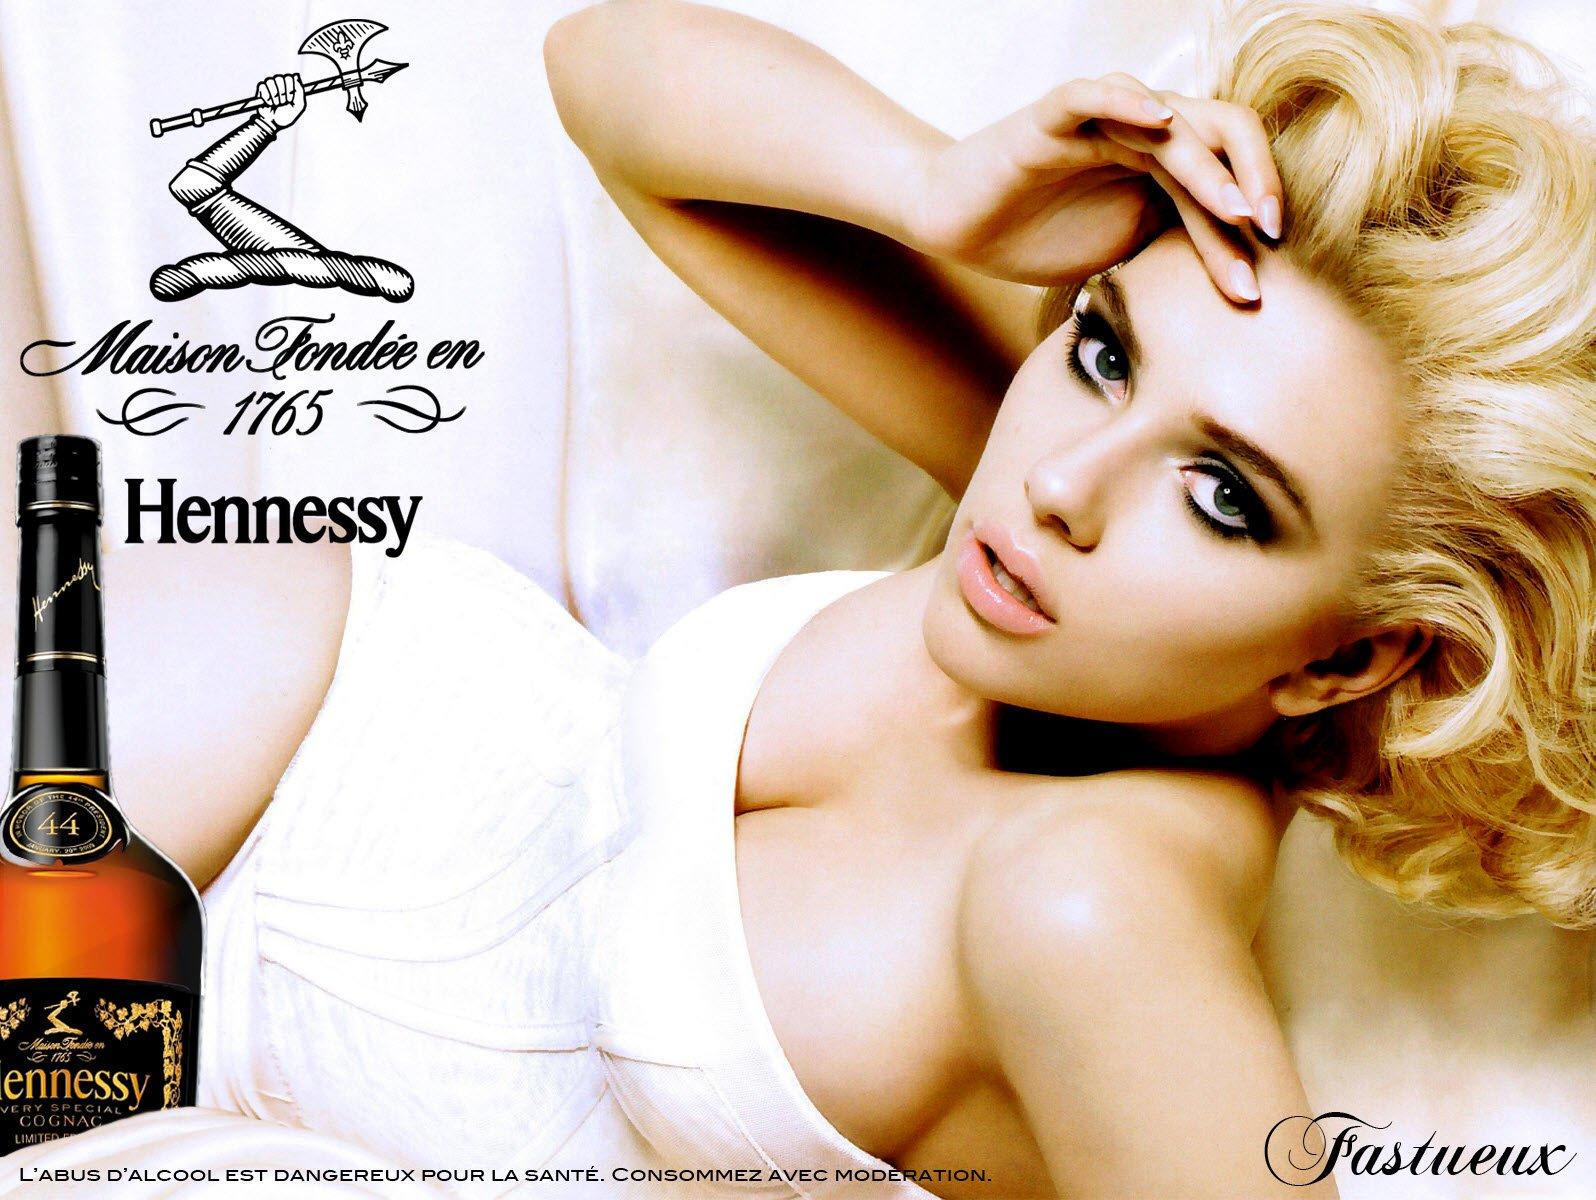 Hennessy-Cognac-Scarlett-Johansson-ad-3